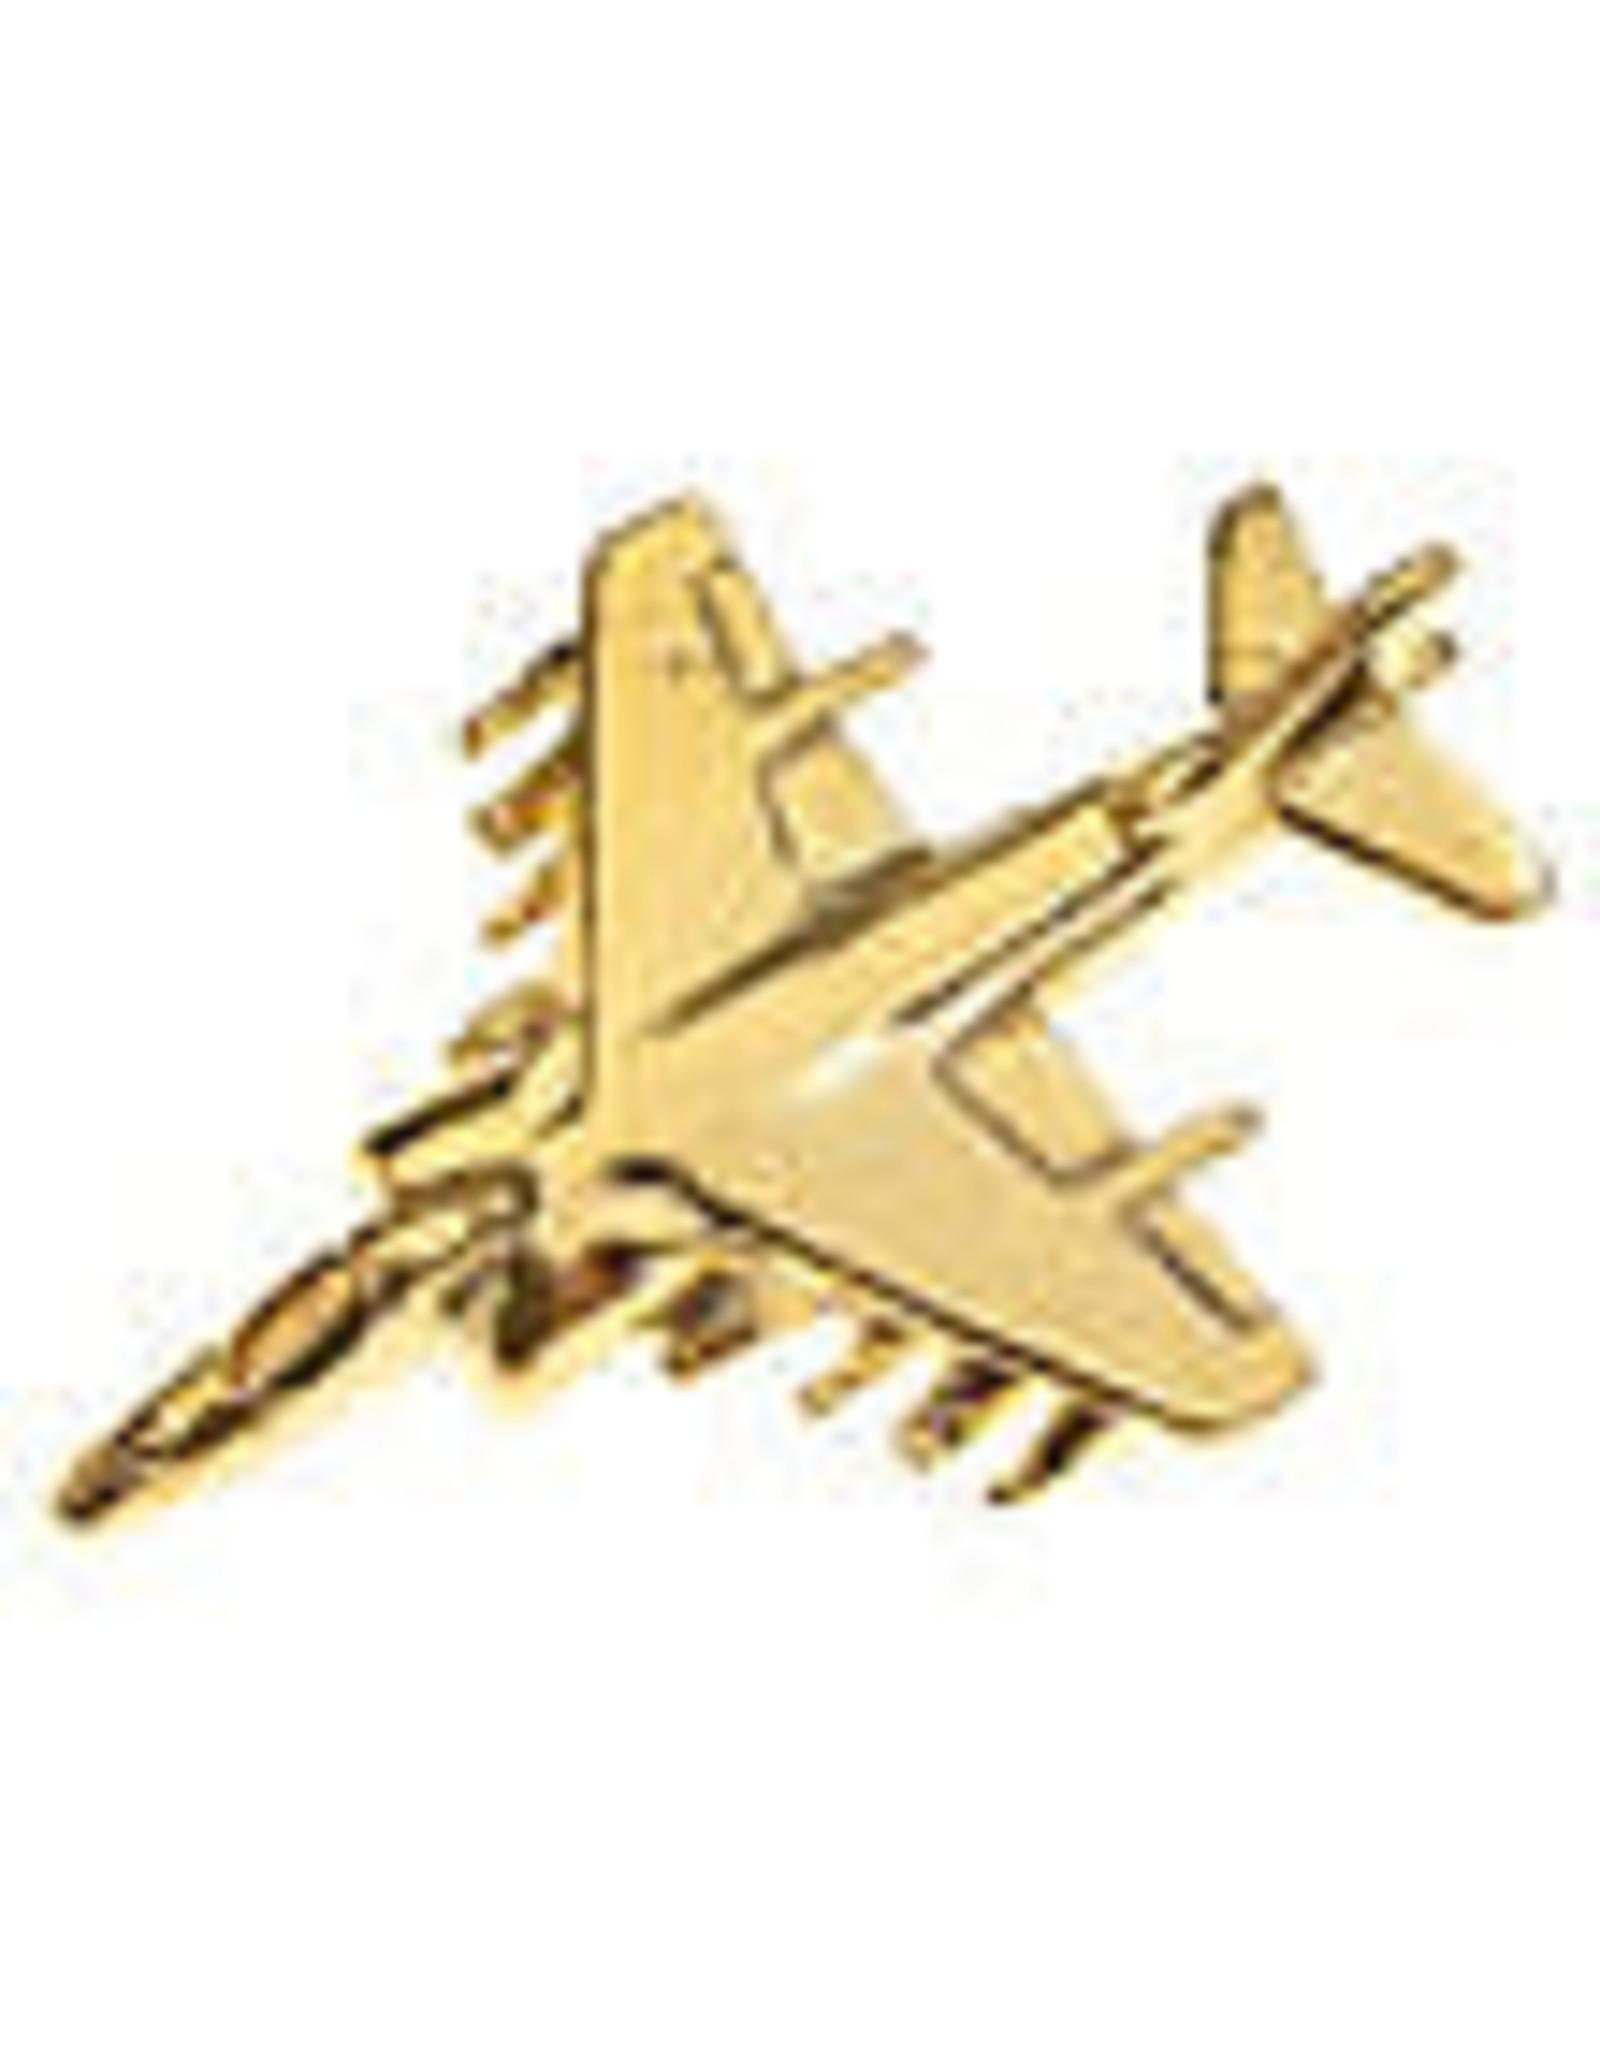 Clivedon Pin Badge AV-8 Harrier, Pin, Gold